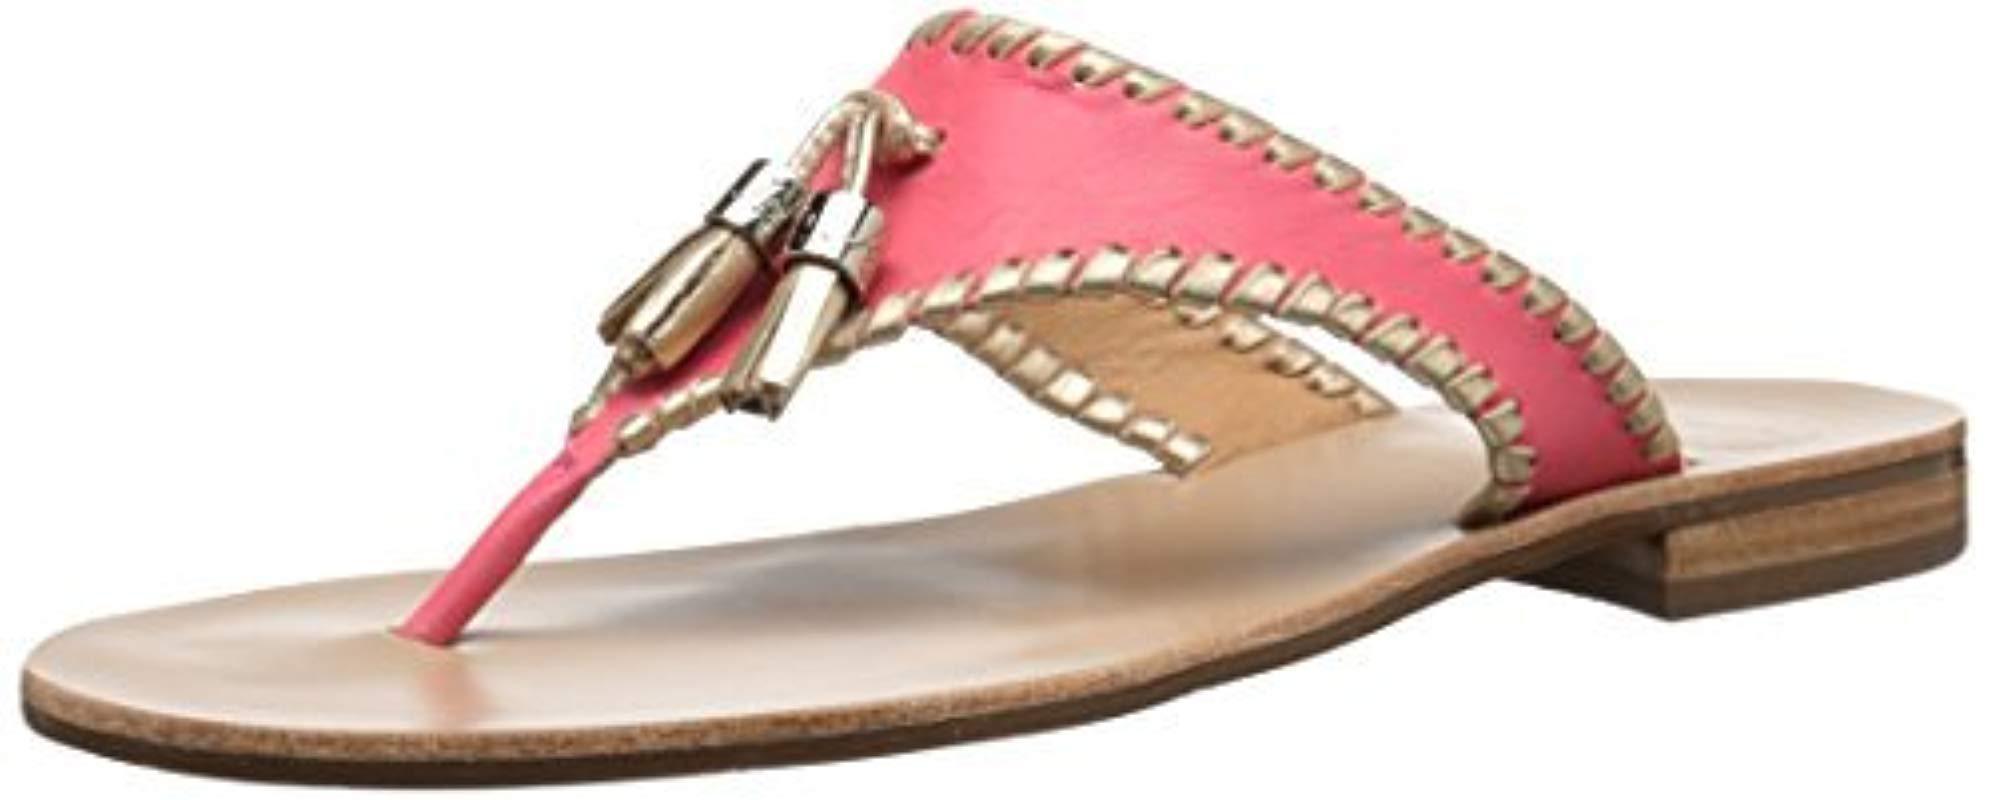 1fe65aa06d0a Lyst - Jack Rogers Alana Dress Sandal in Pink